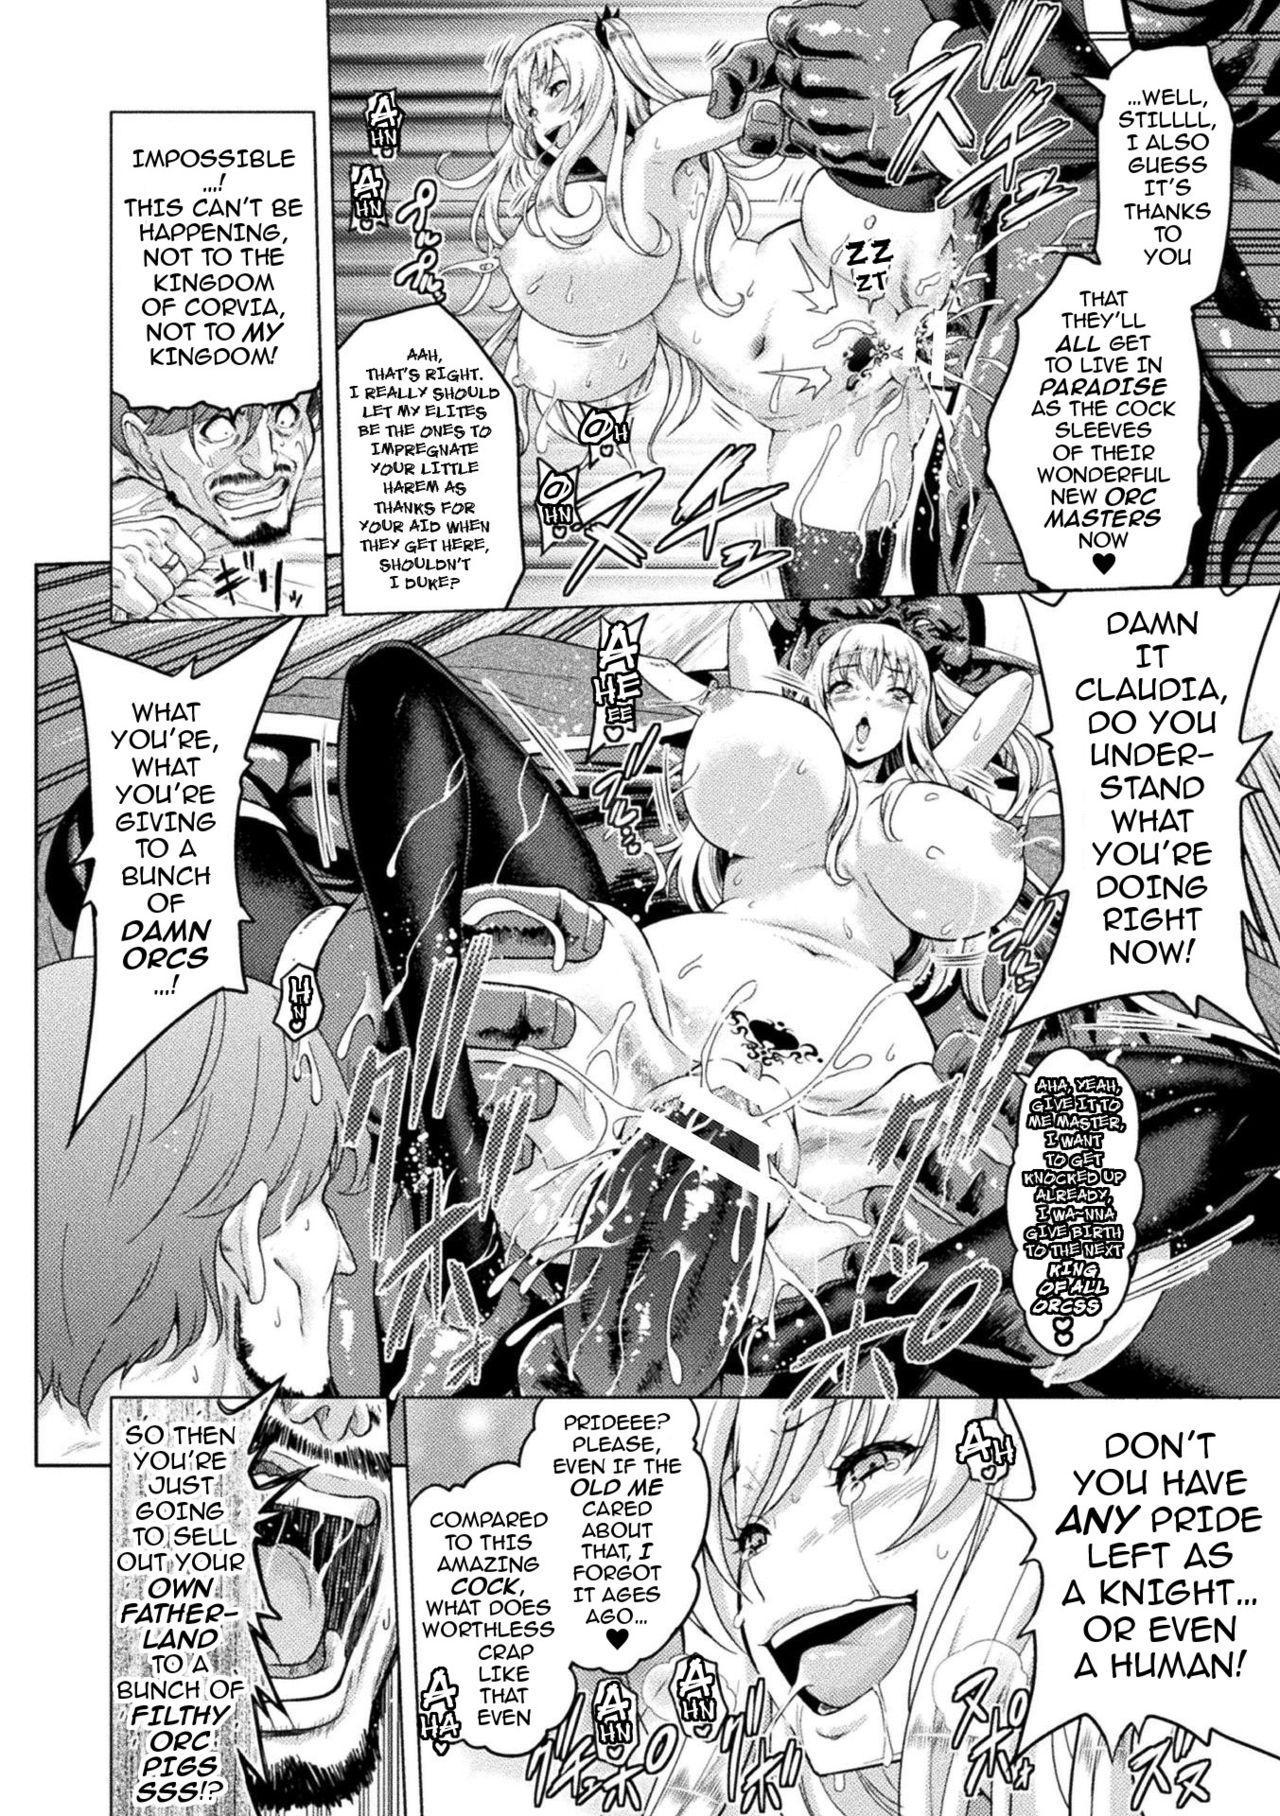 [Yamada Gogogo] Erona ~Orc no Inmon ni Okasareta Onna Kishi no Matsuro~ | Erona ~The Fall of a Beautiful Knight Cursed with the Lewd Mark of an Orc~ Ch. 1-5 [English] {darknight} 98